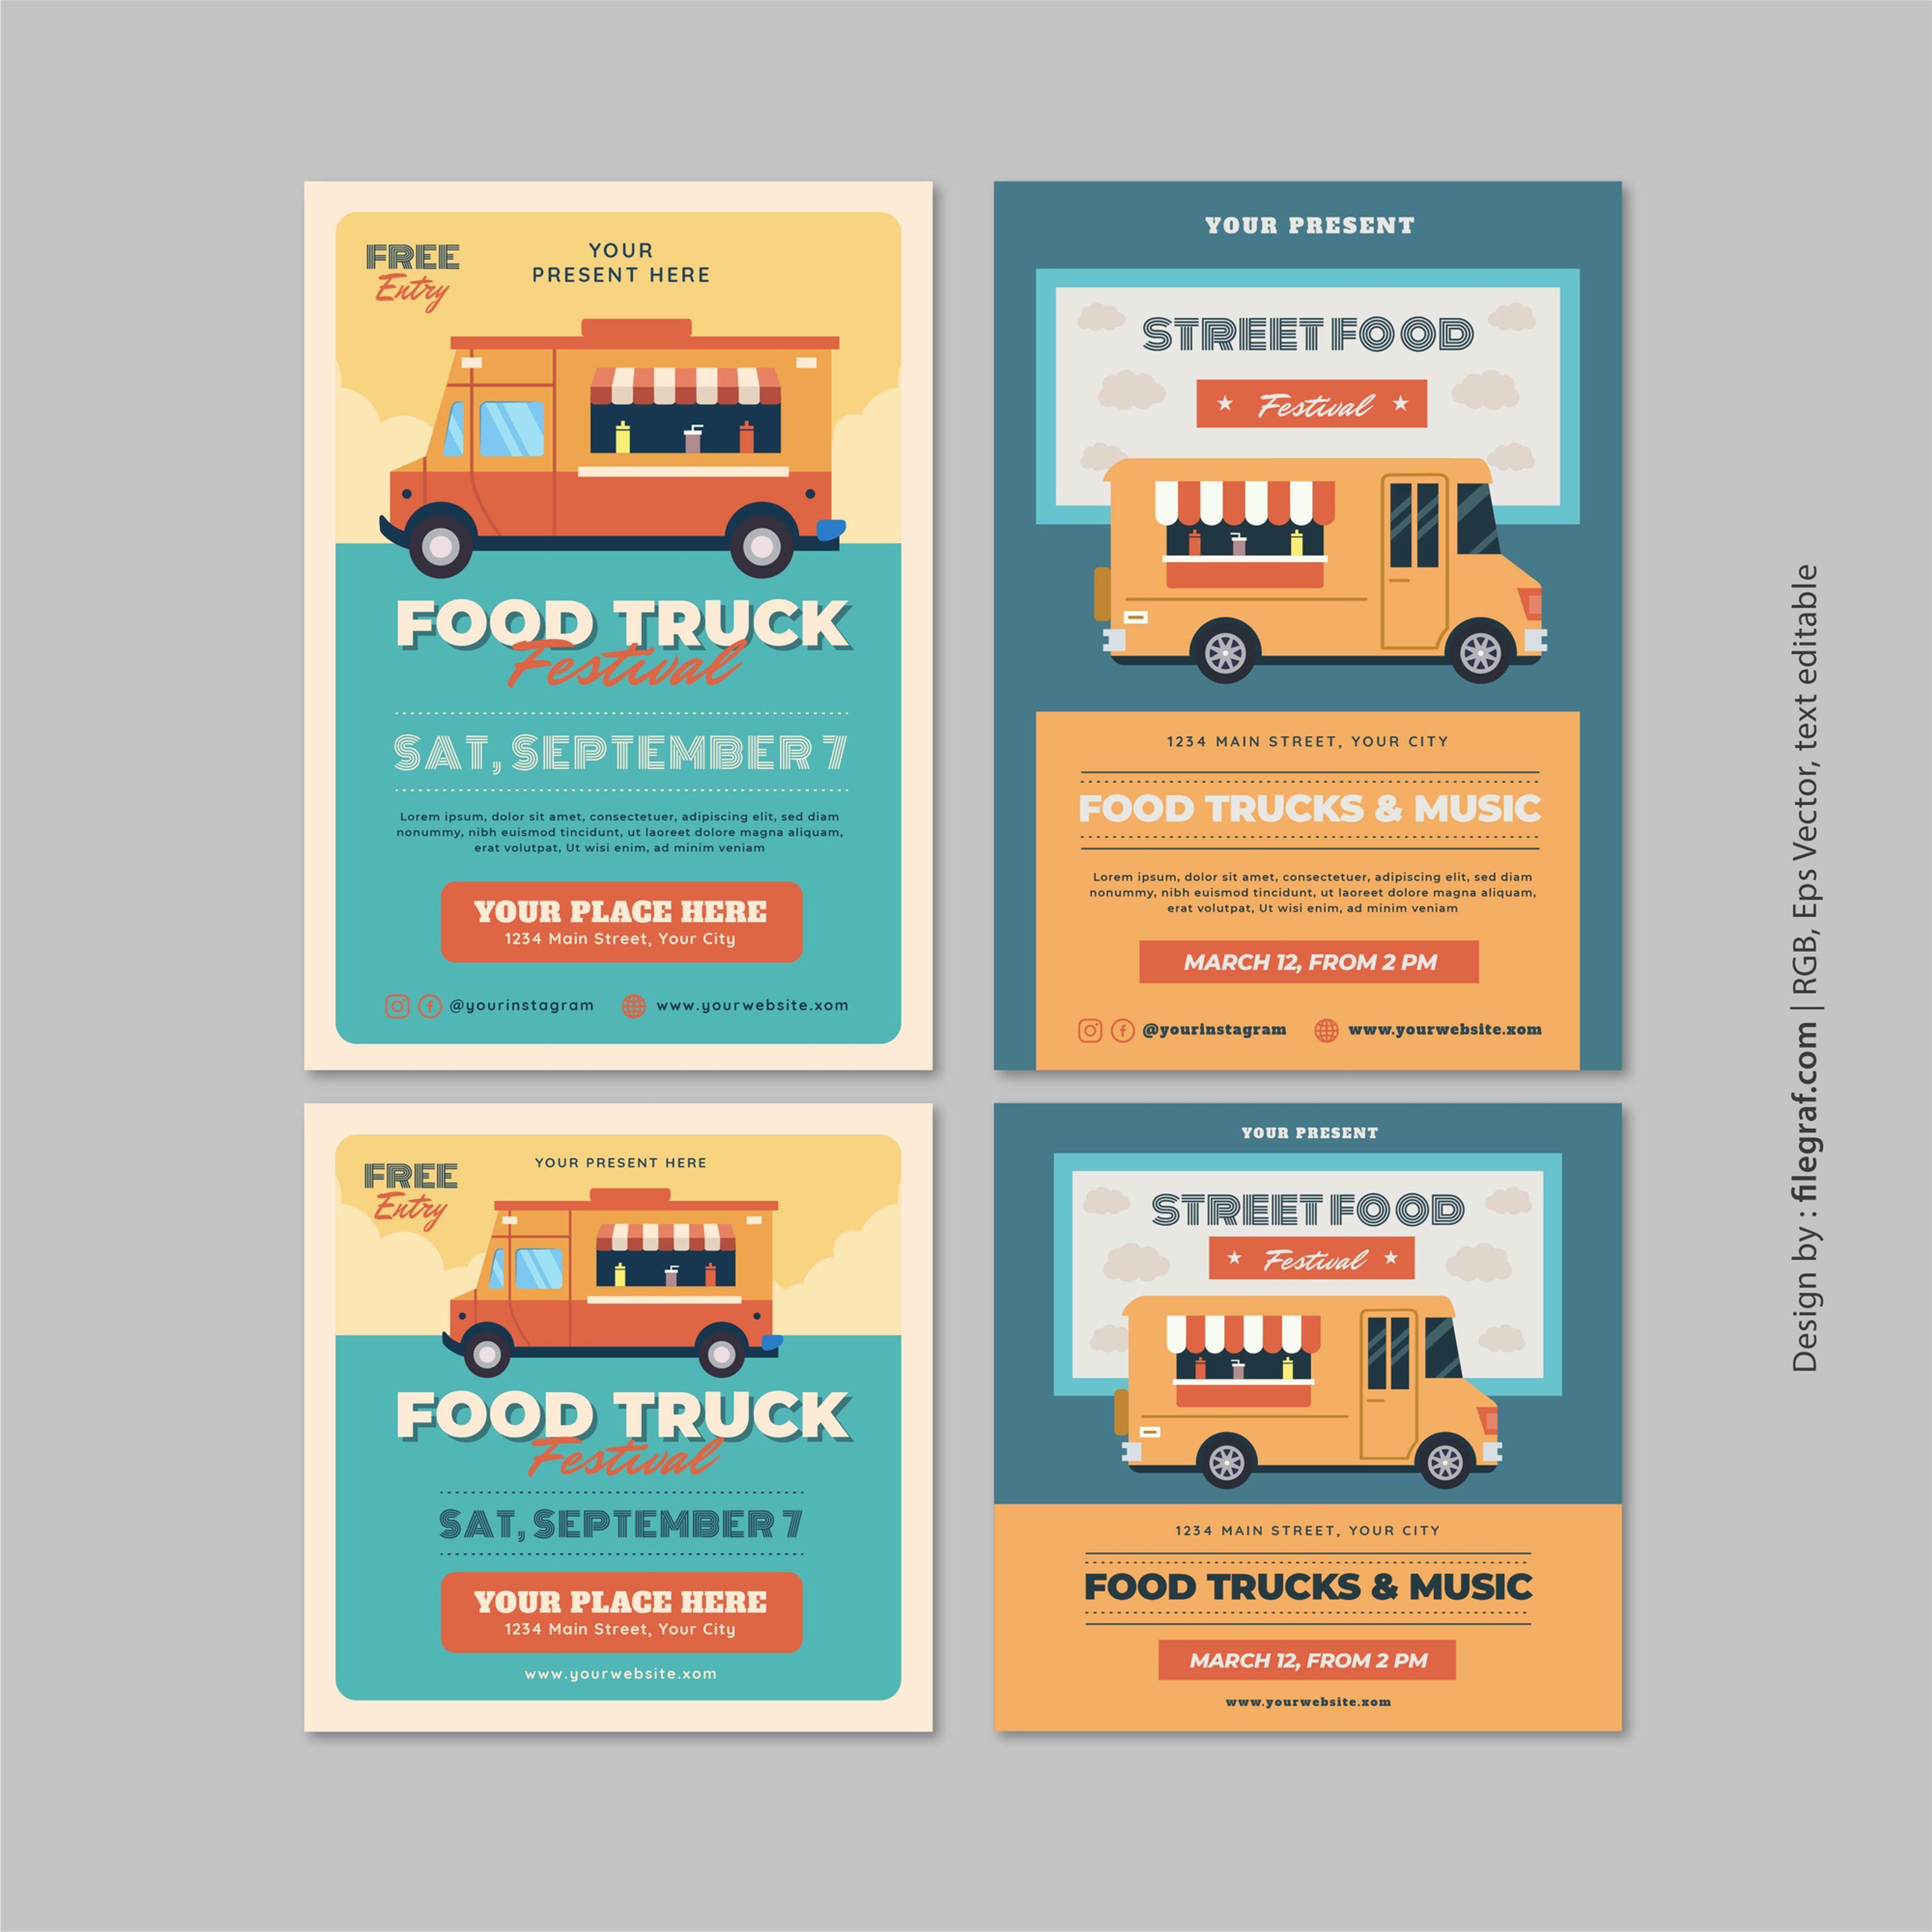 Food truck festival event flyer poster social media